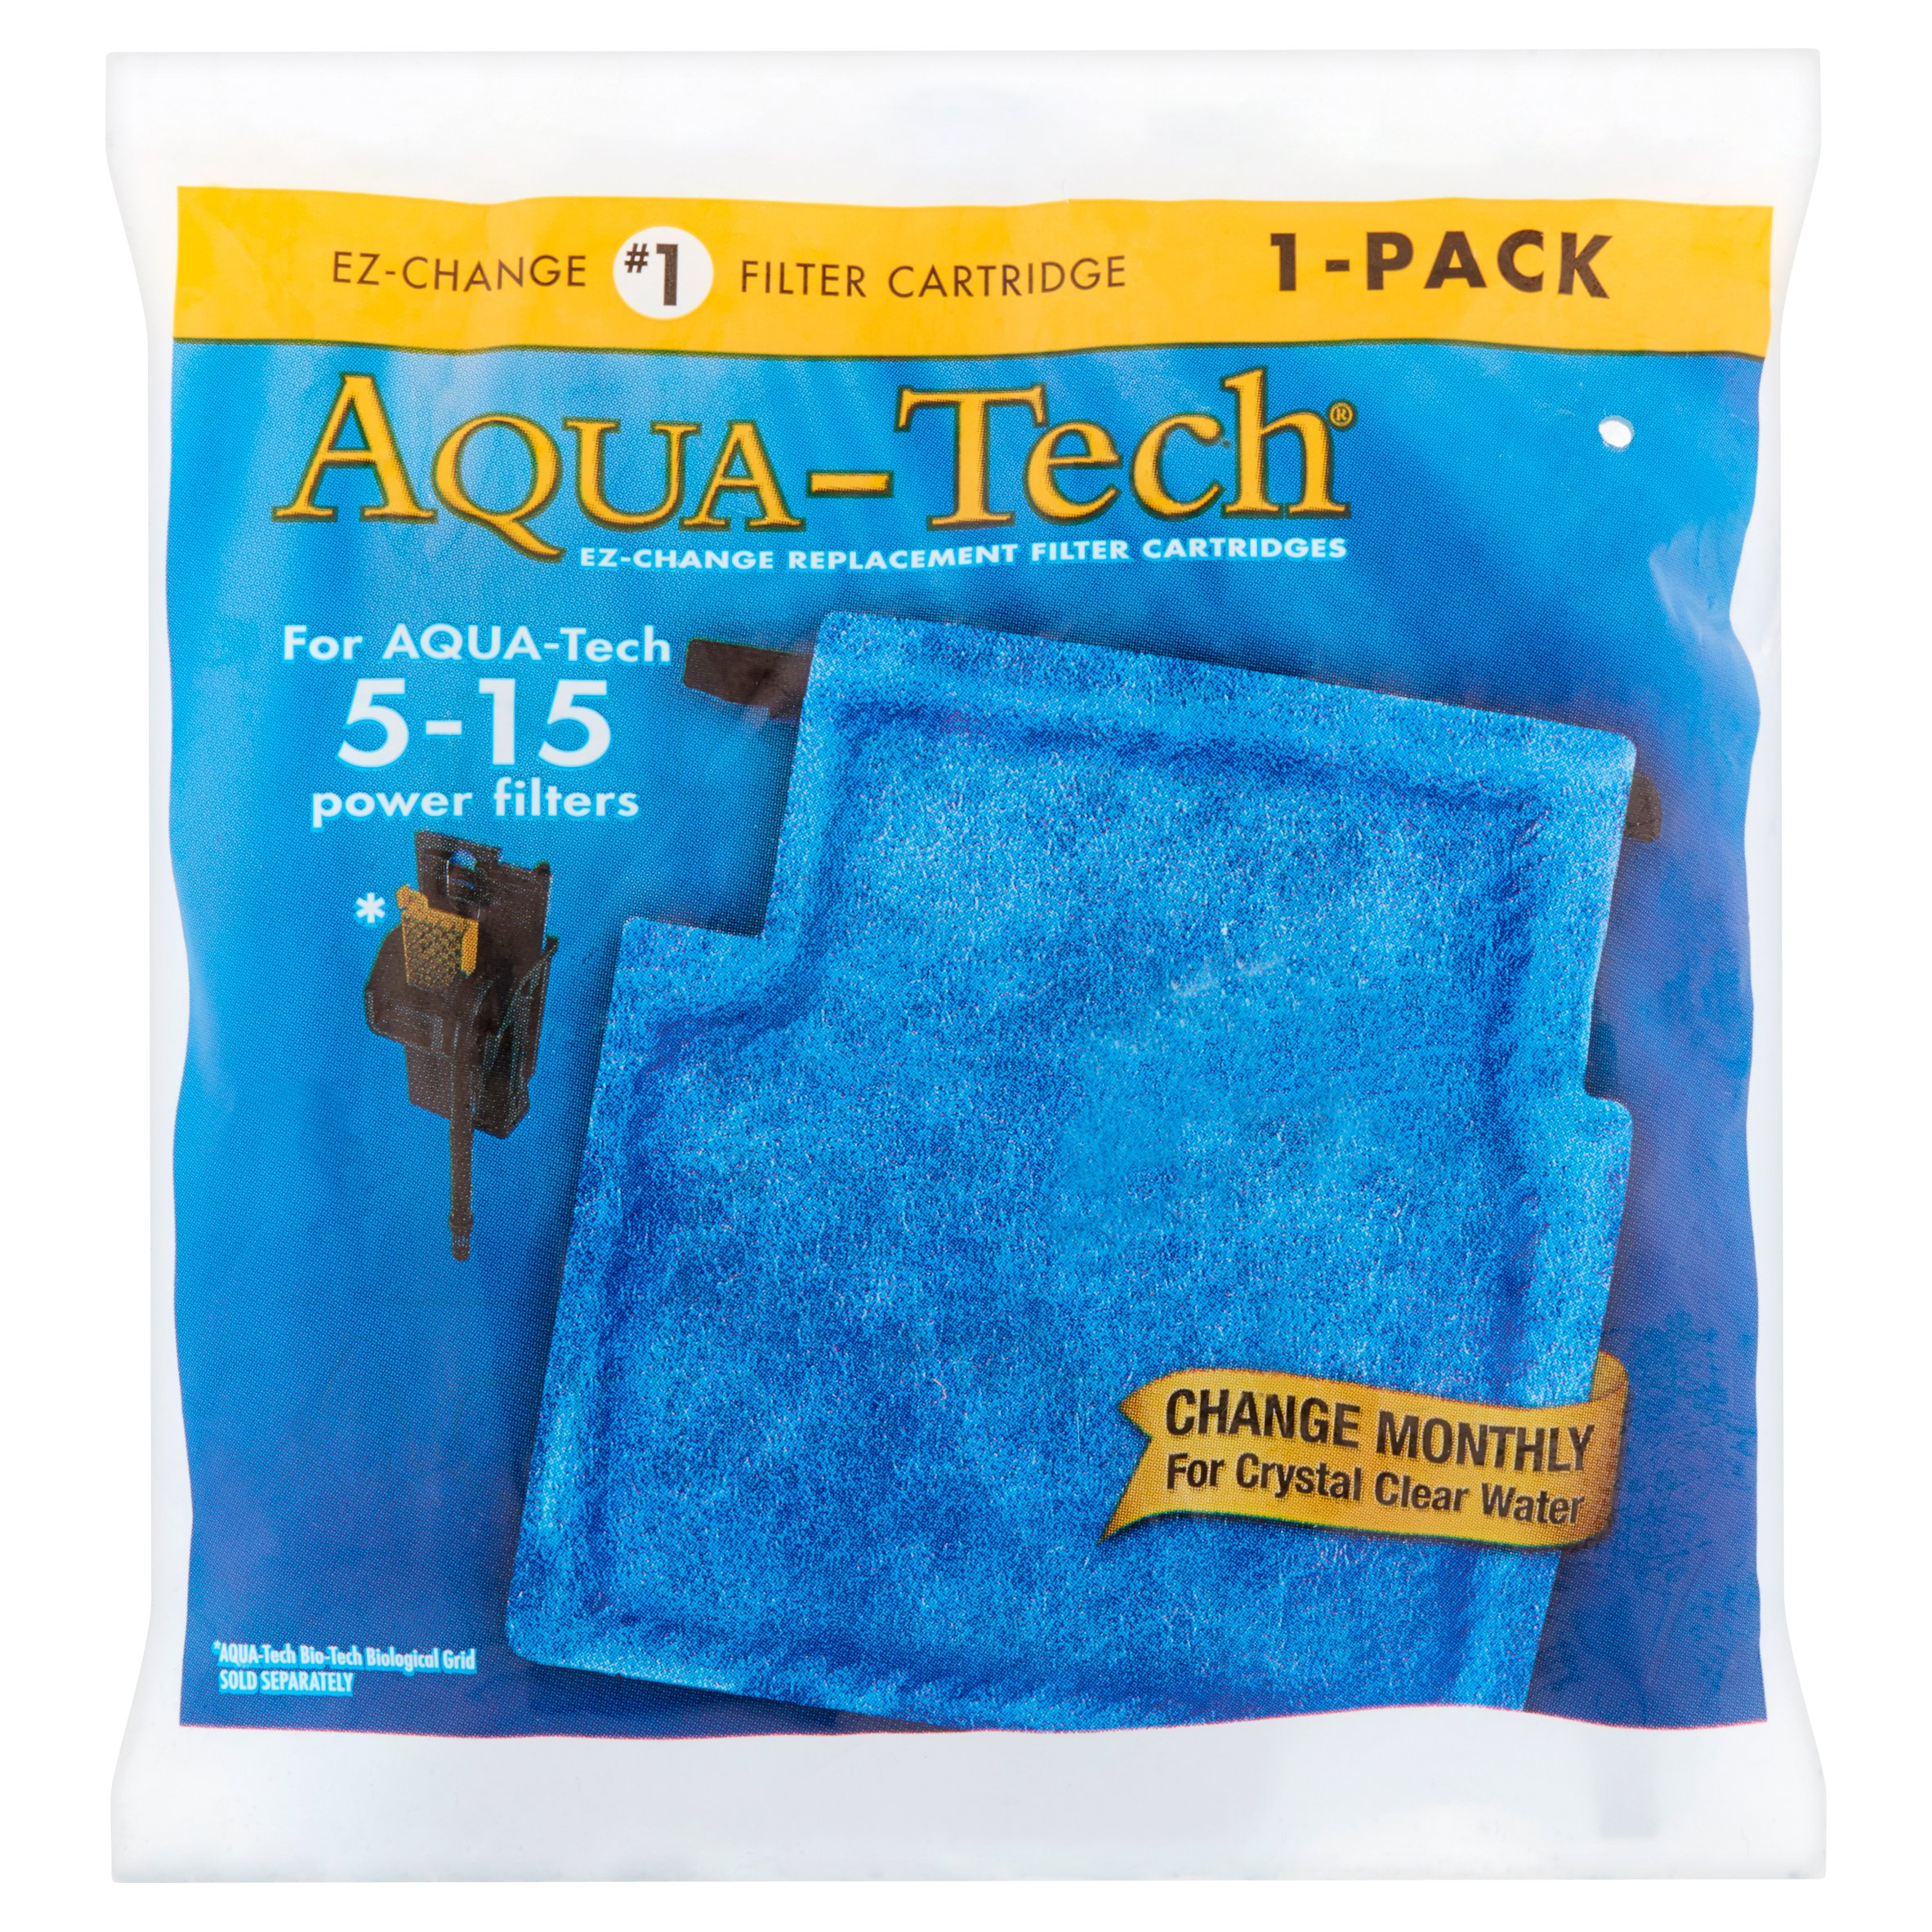 Aqua-Tech EZ-Change #1 Filter Cartridge for 15-15 Filters, 1 pack